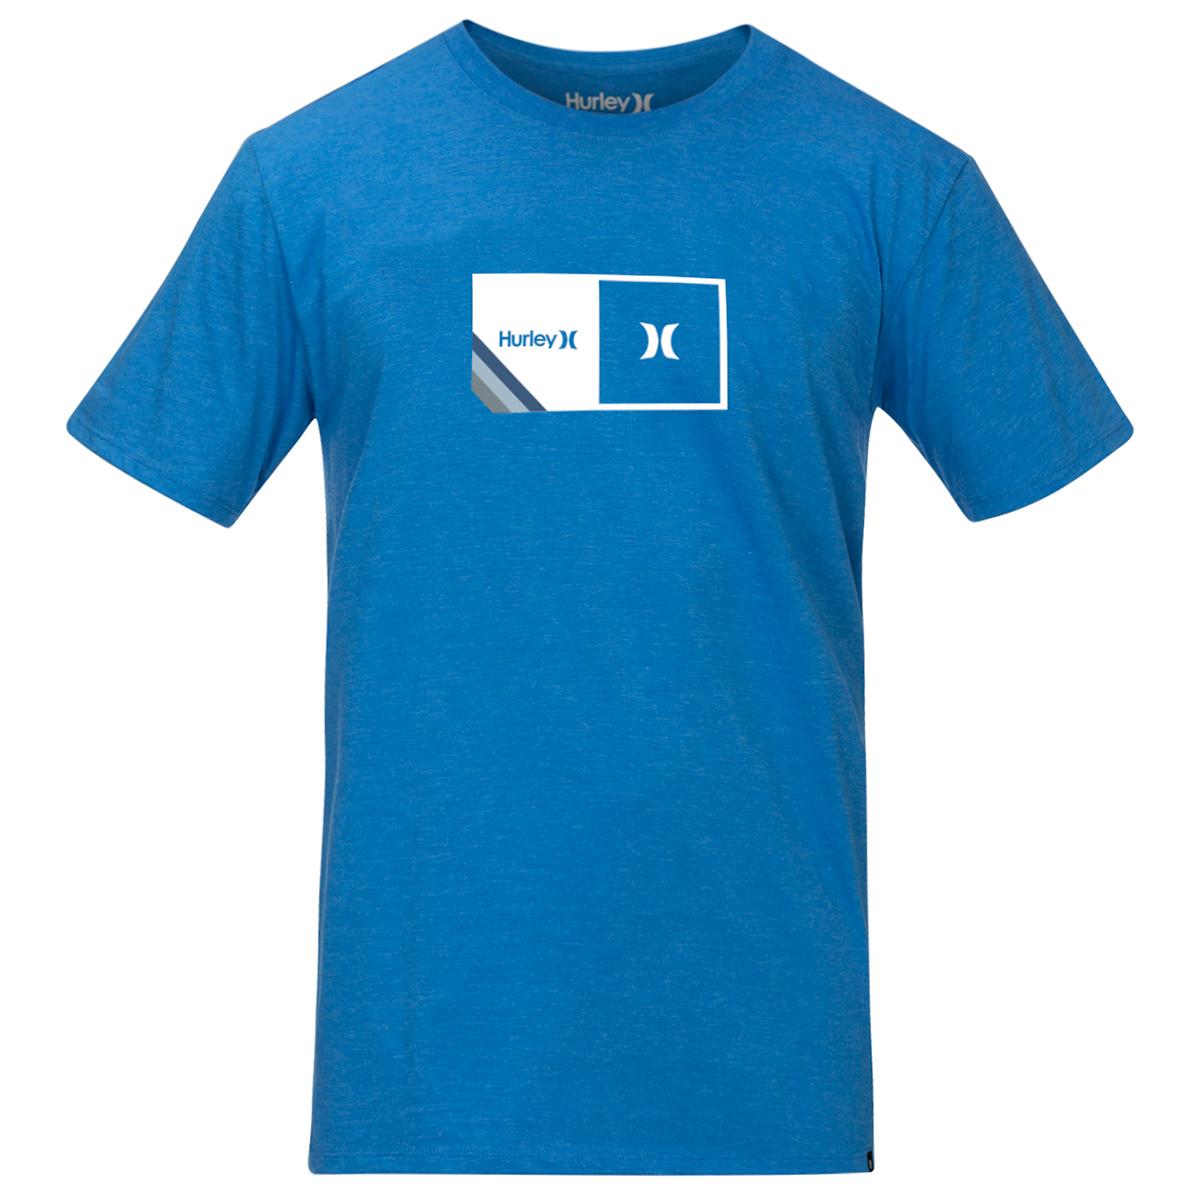 Hurley Men's Short-Sleeve Halfer Stripe Tee - Blue, M